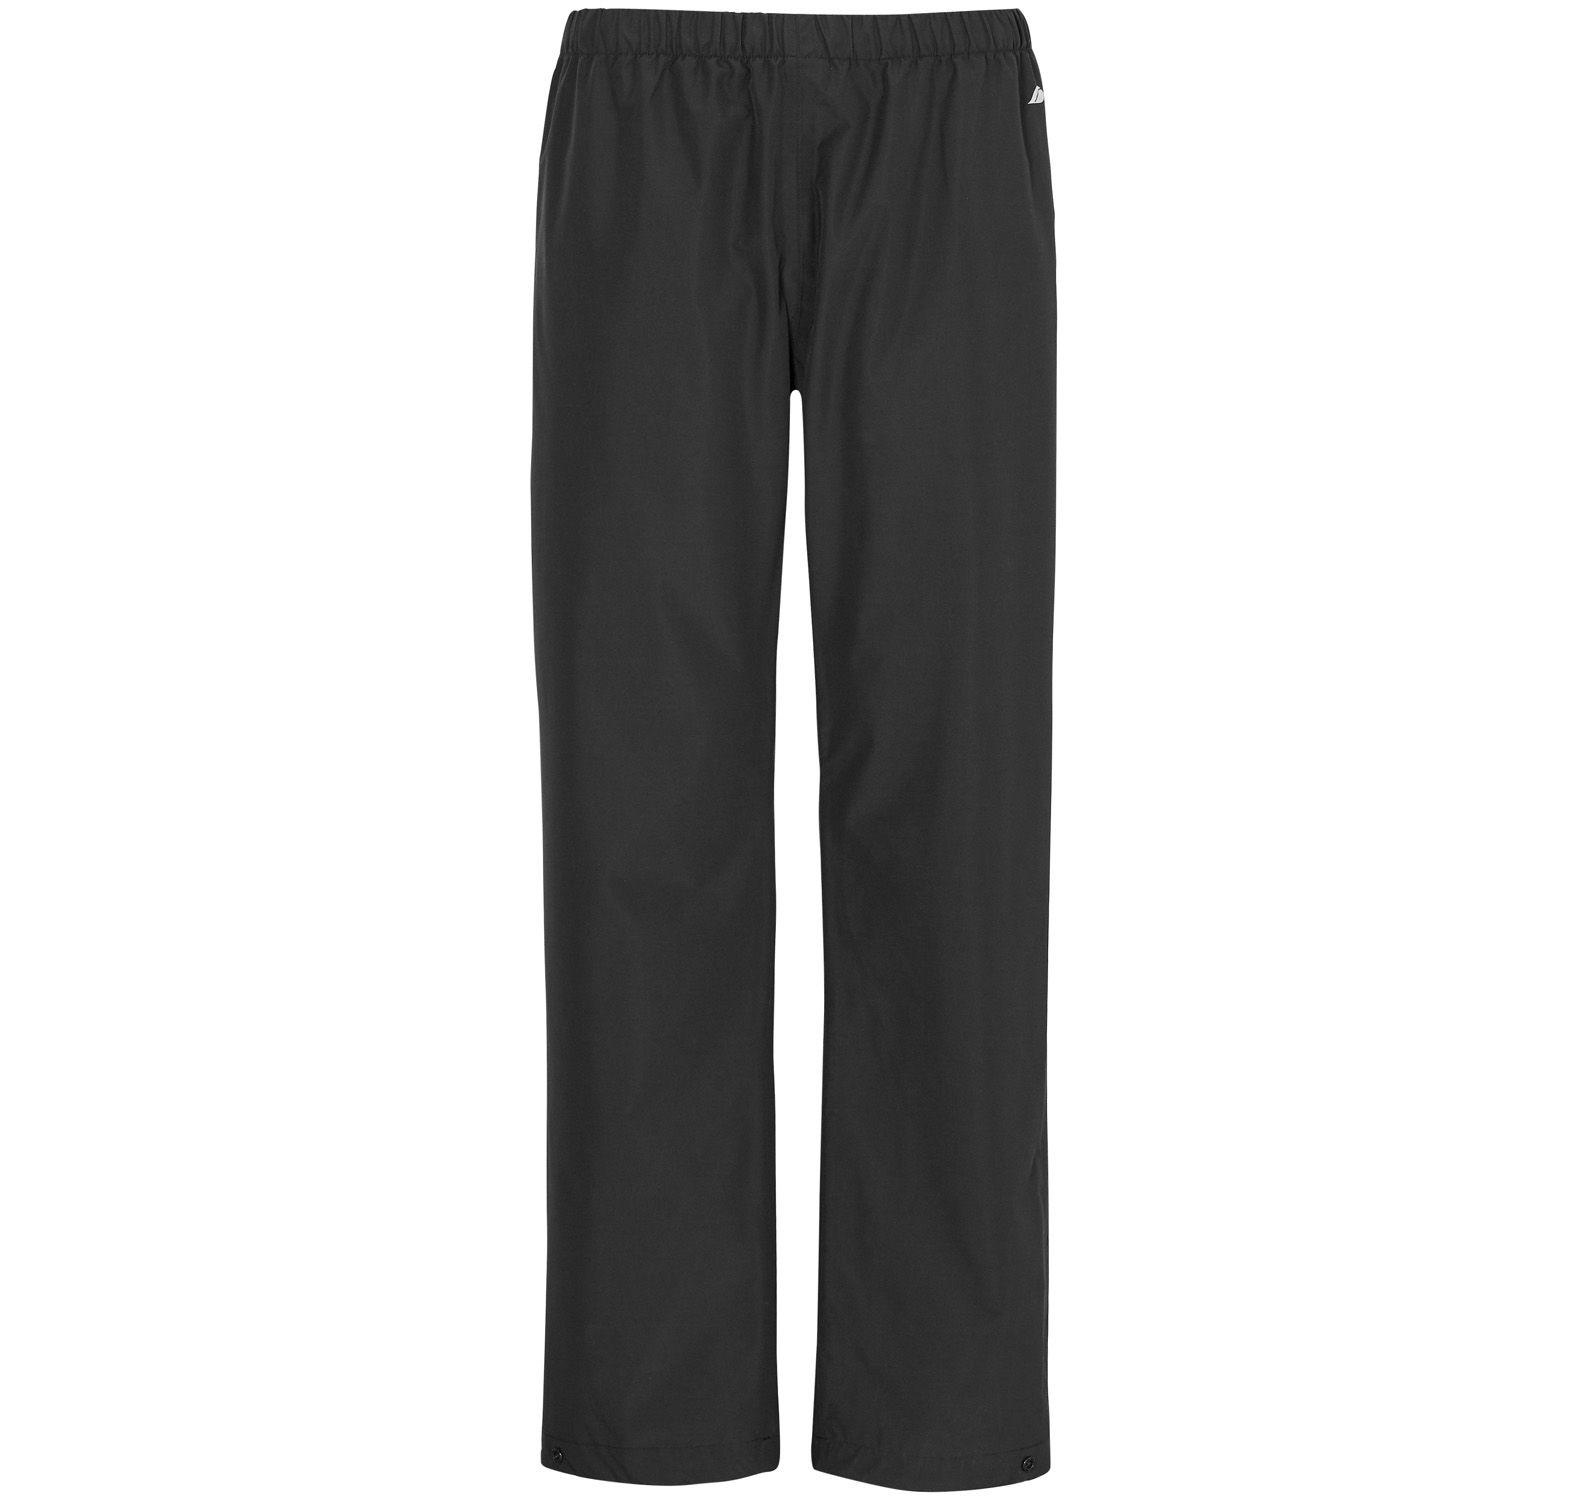 Grand Usx Pants, Black, Xl, Didriksons Regnkläder